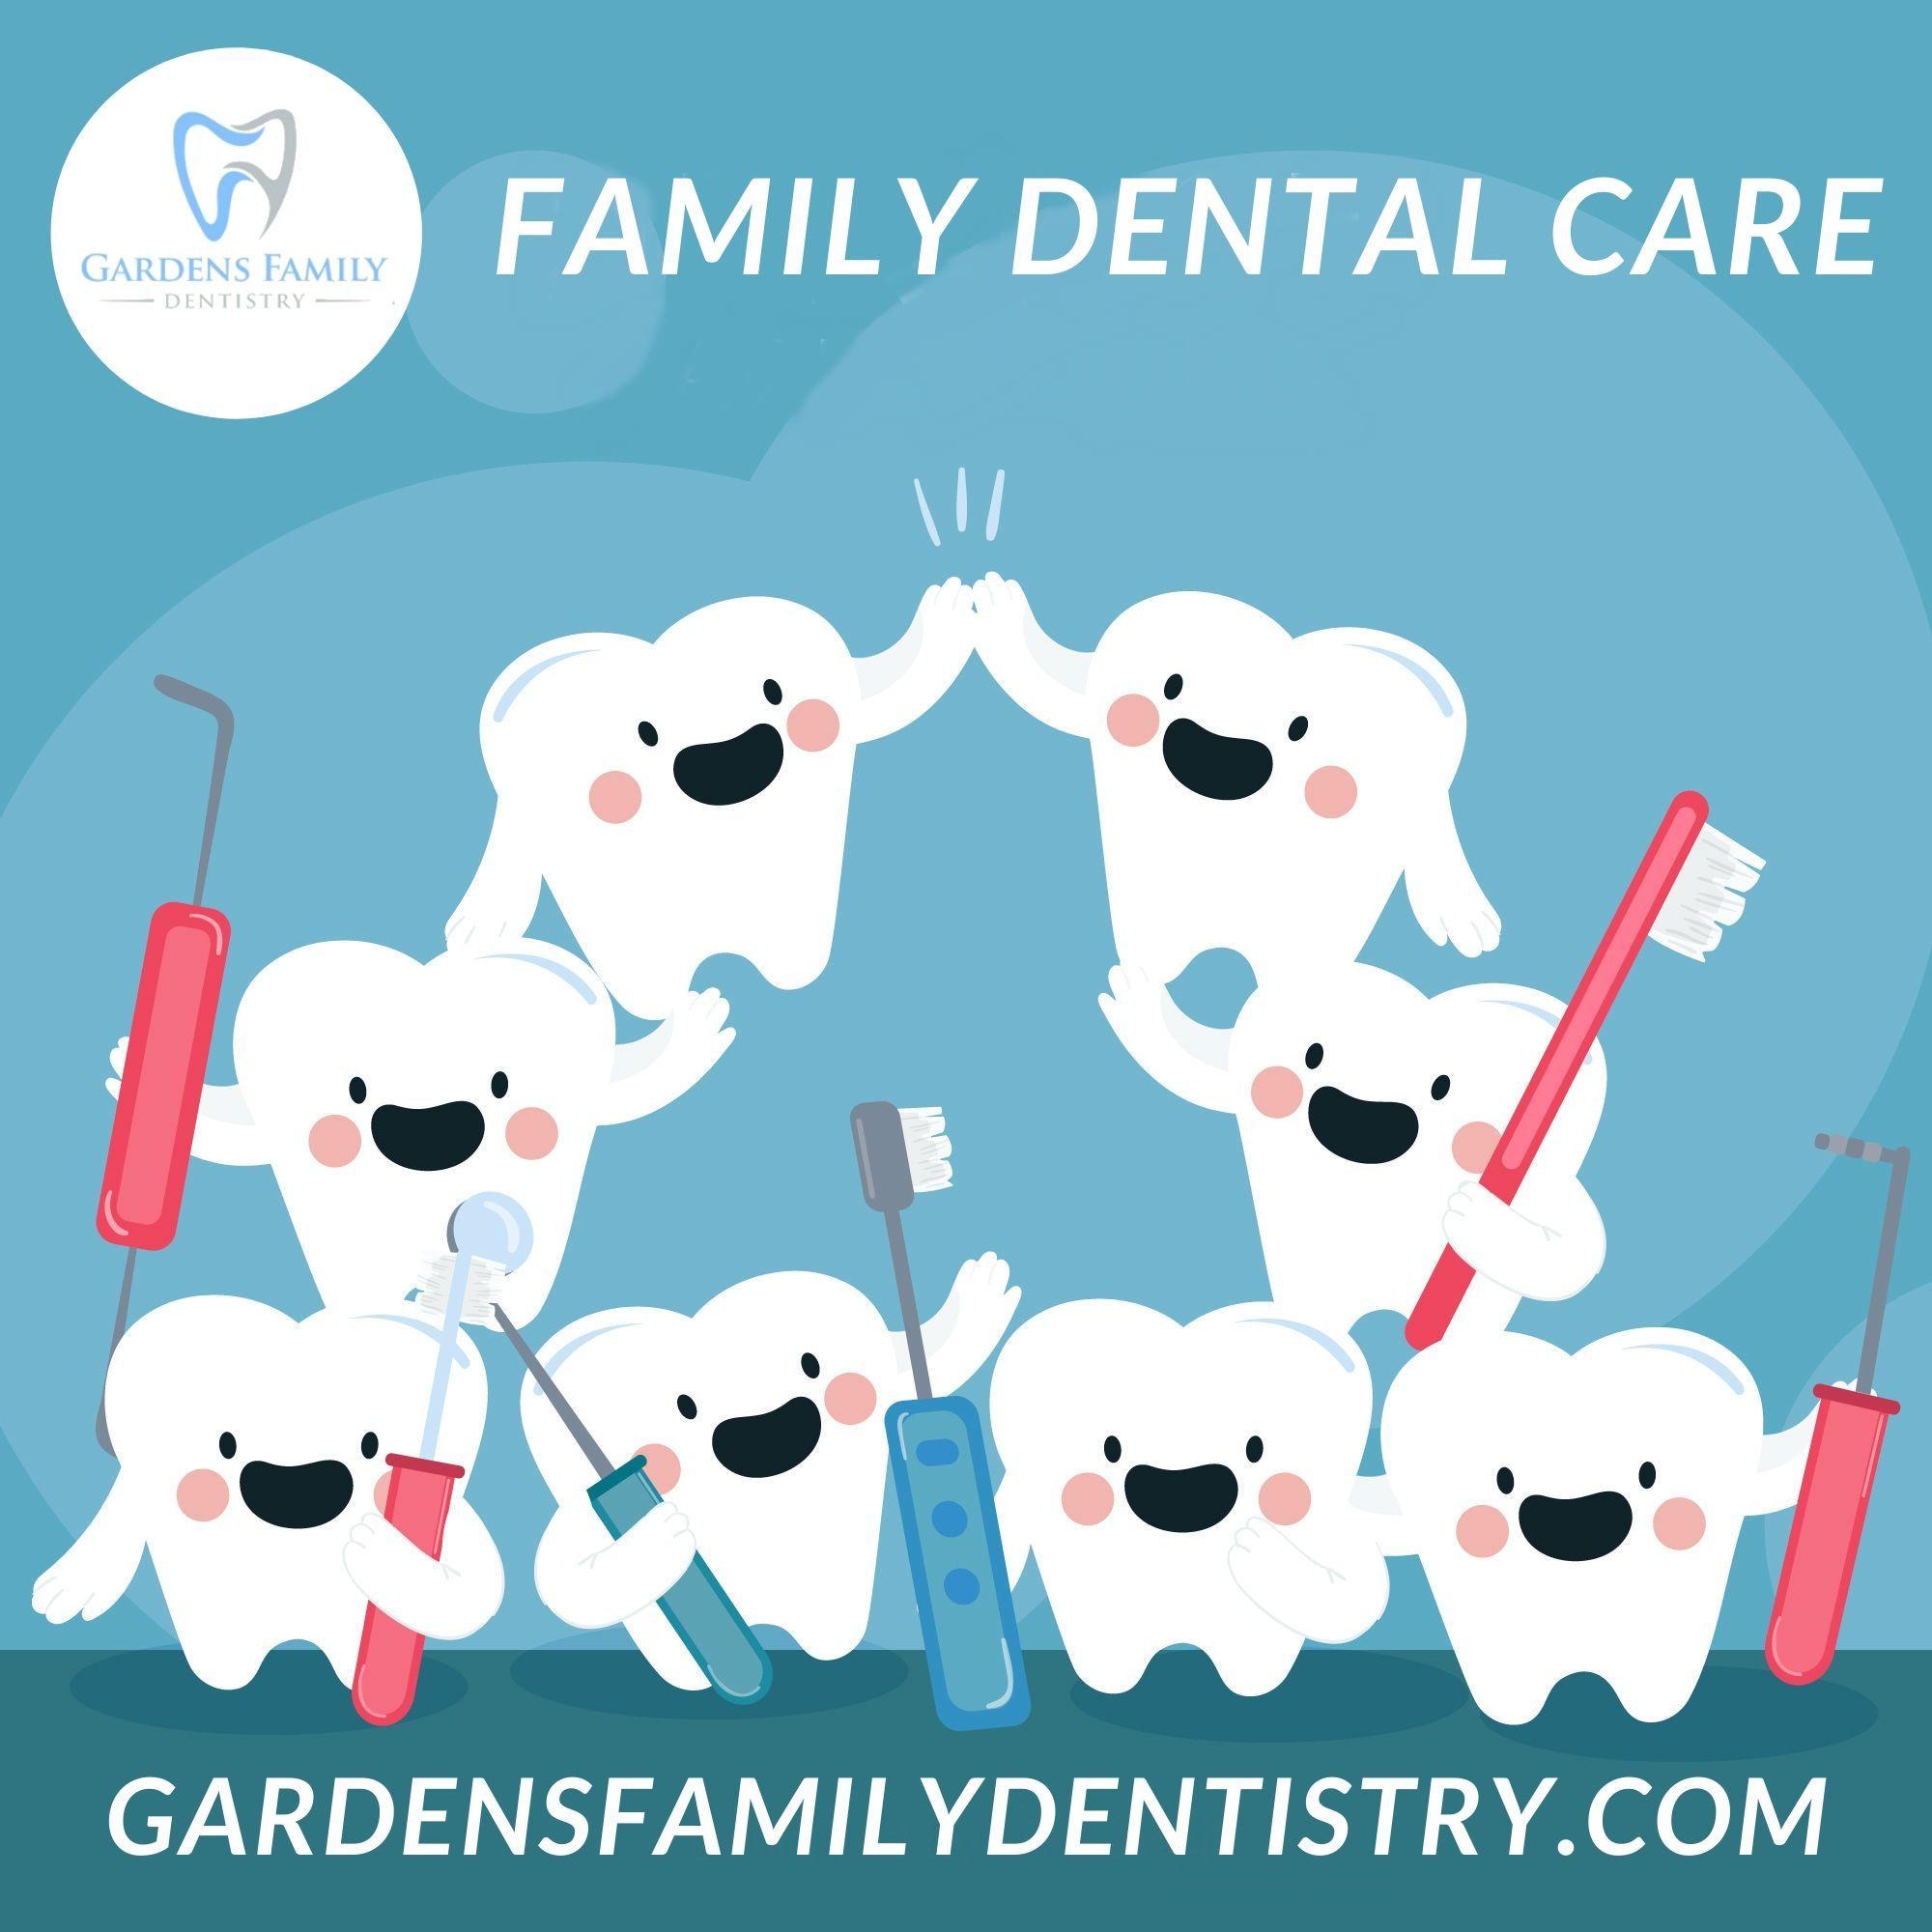 Looking for Palm Beach Gardens dentist or dental clinic